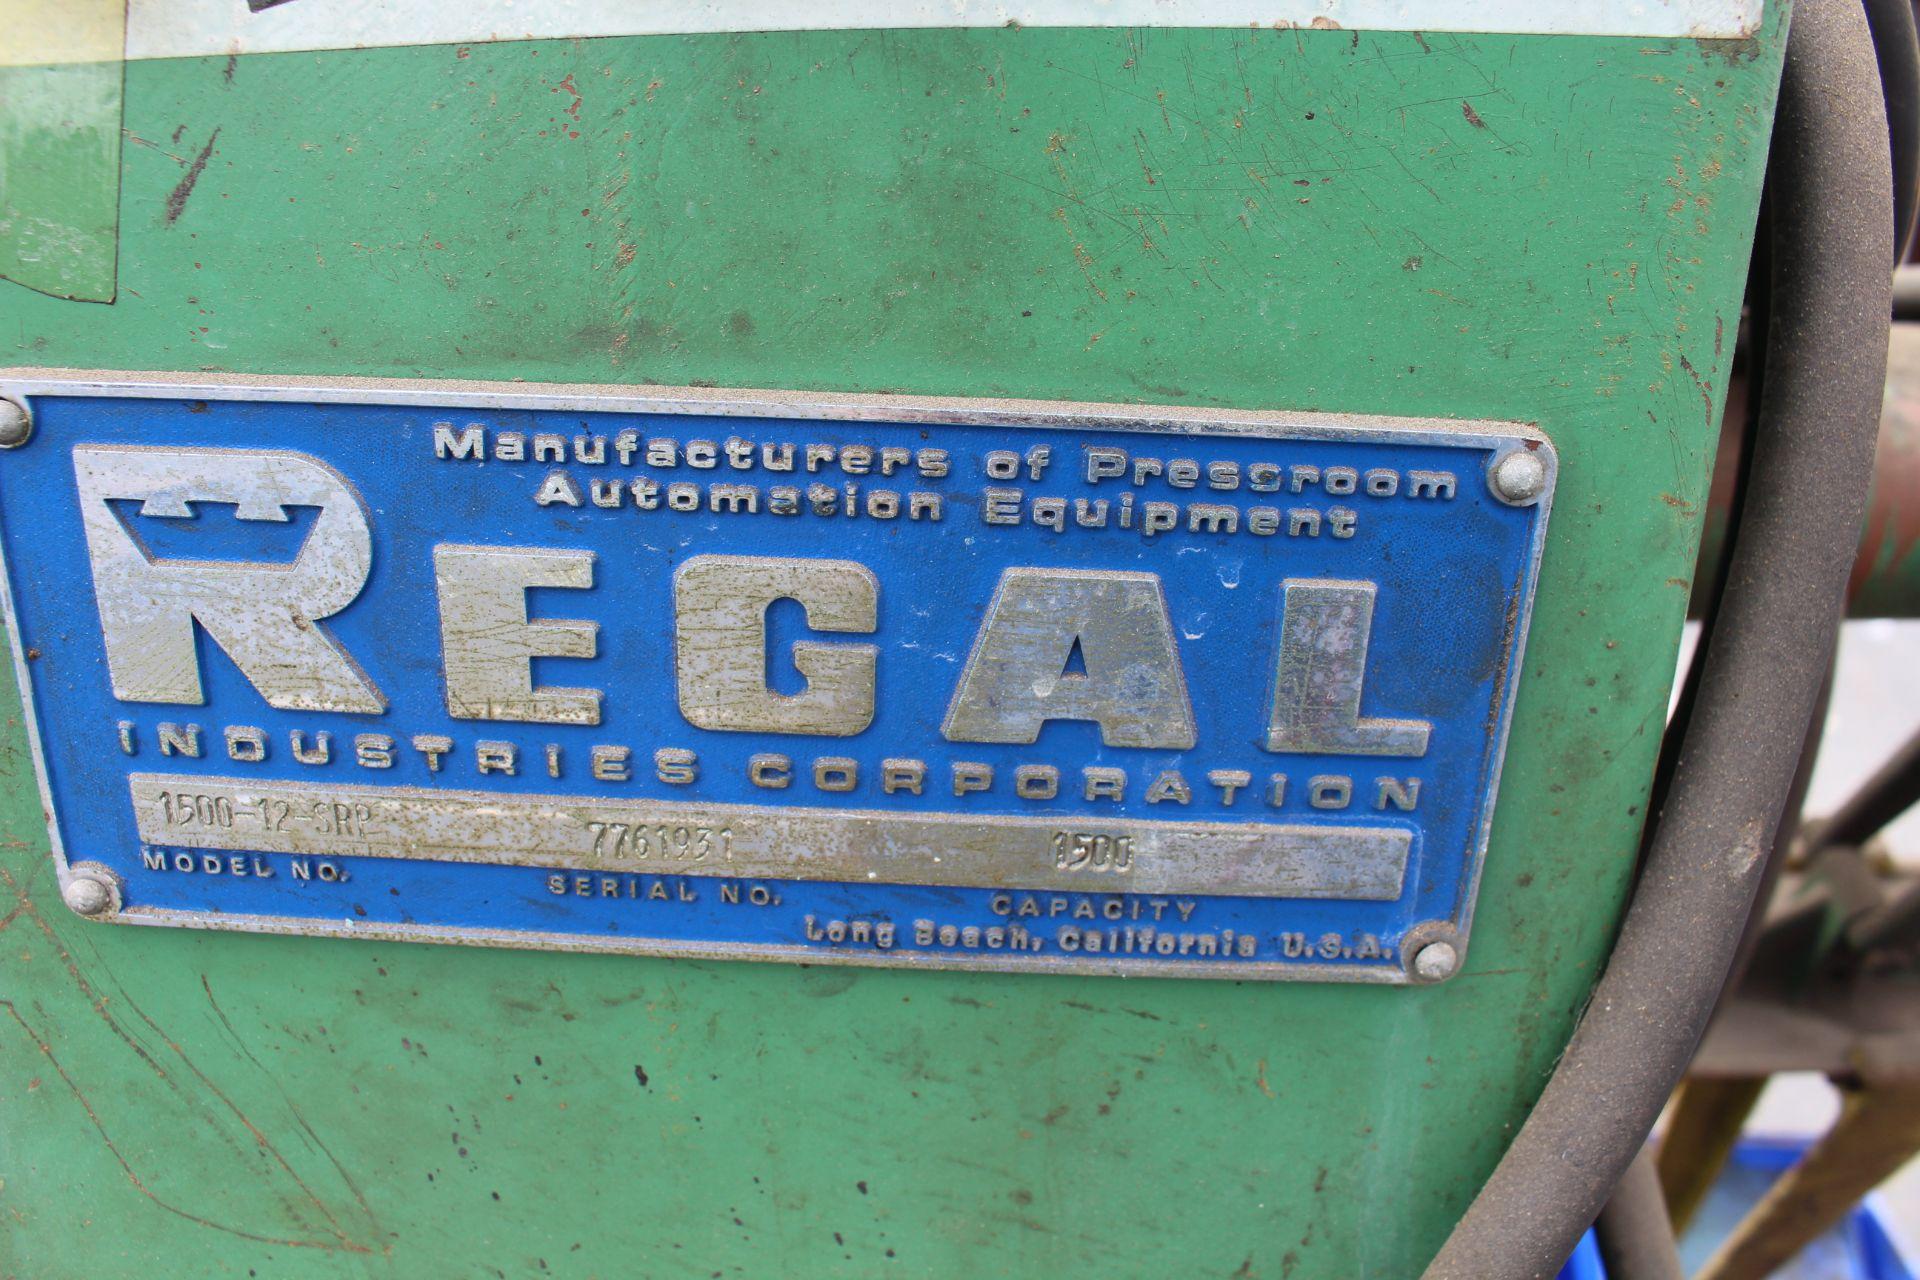 REGAL MODEL 1500-12-SRP COIL REEL, 1500 LB CAPACITY, S/N 7761931 - Image 2 of 2